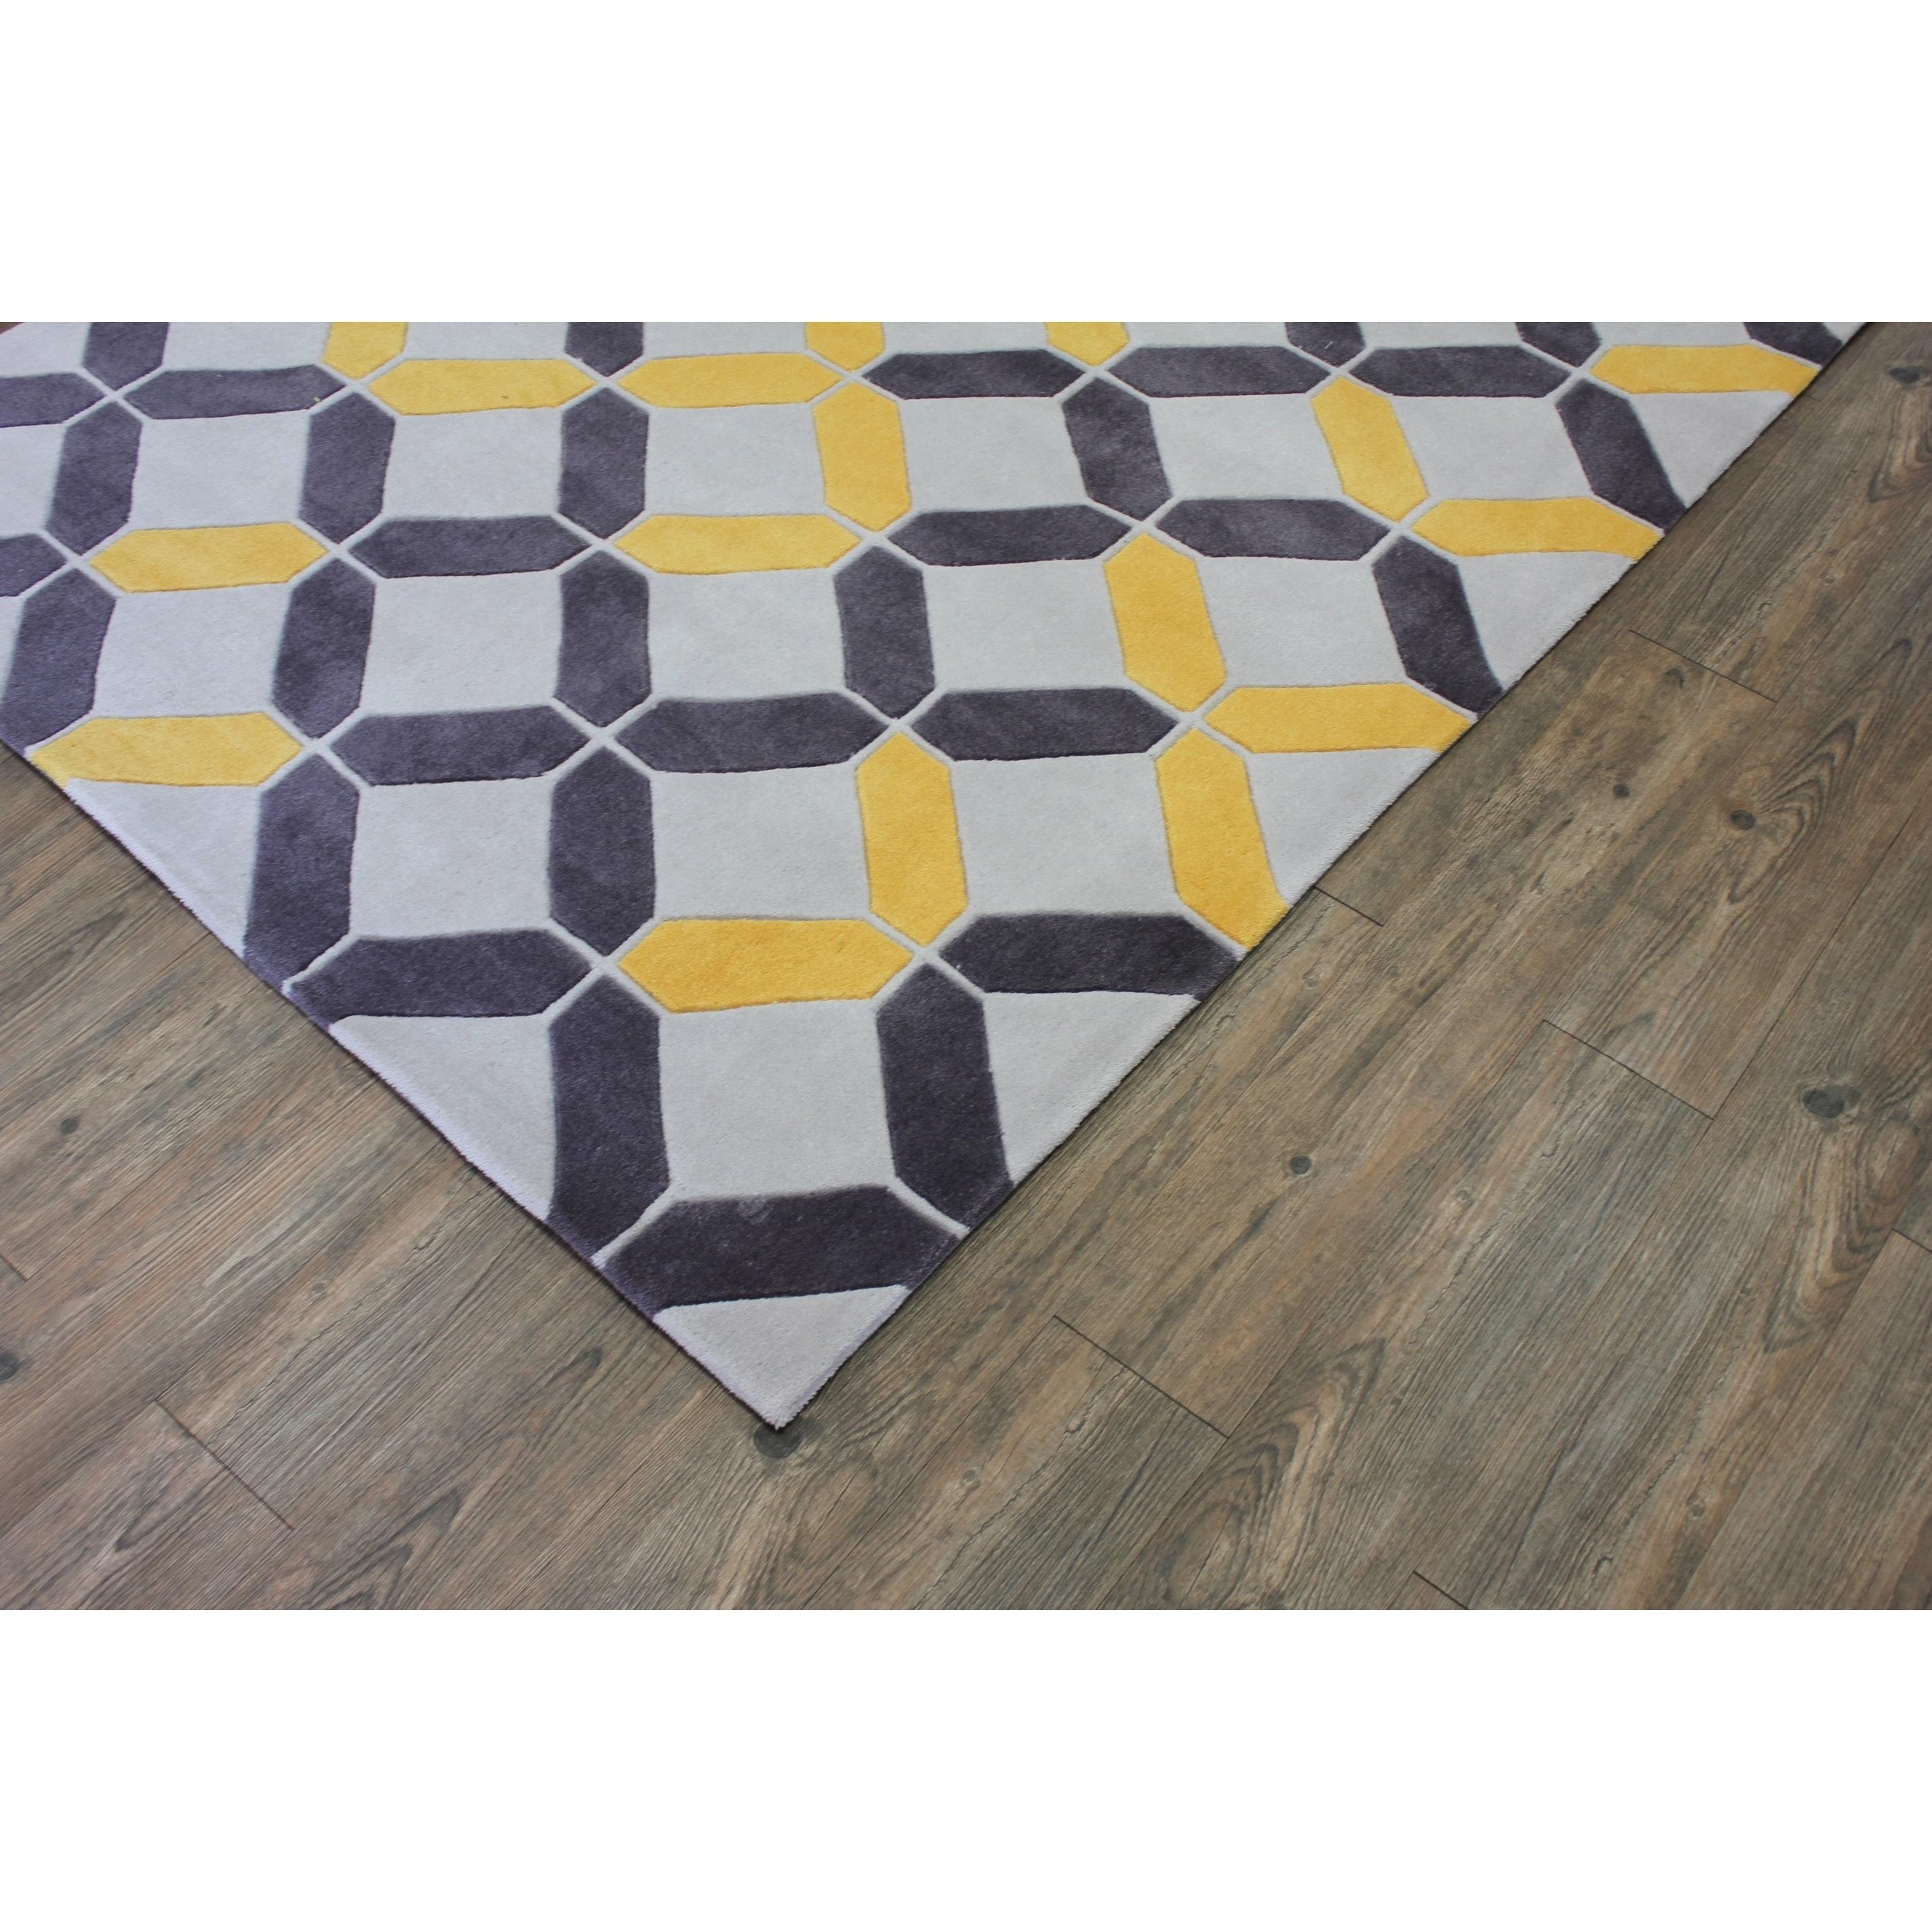 Yellow Grey Beige Color Area Rug - 76 x 106 (Yellow/Grey - 76 x 106)